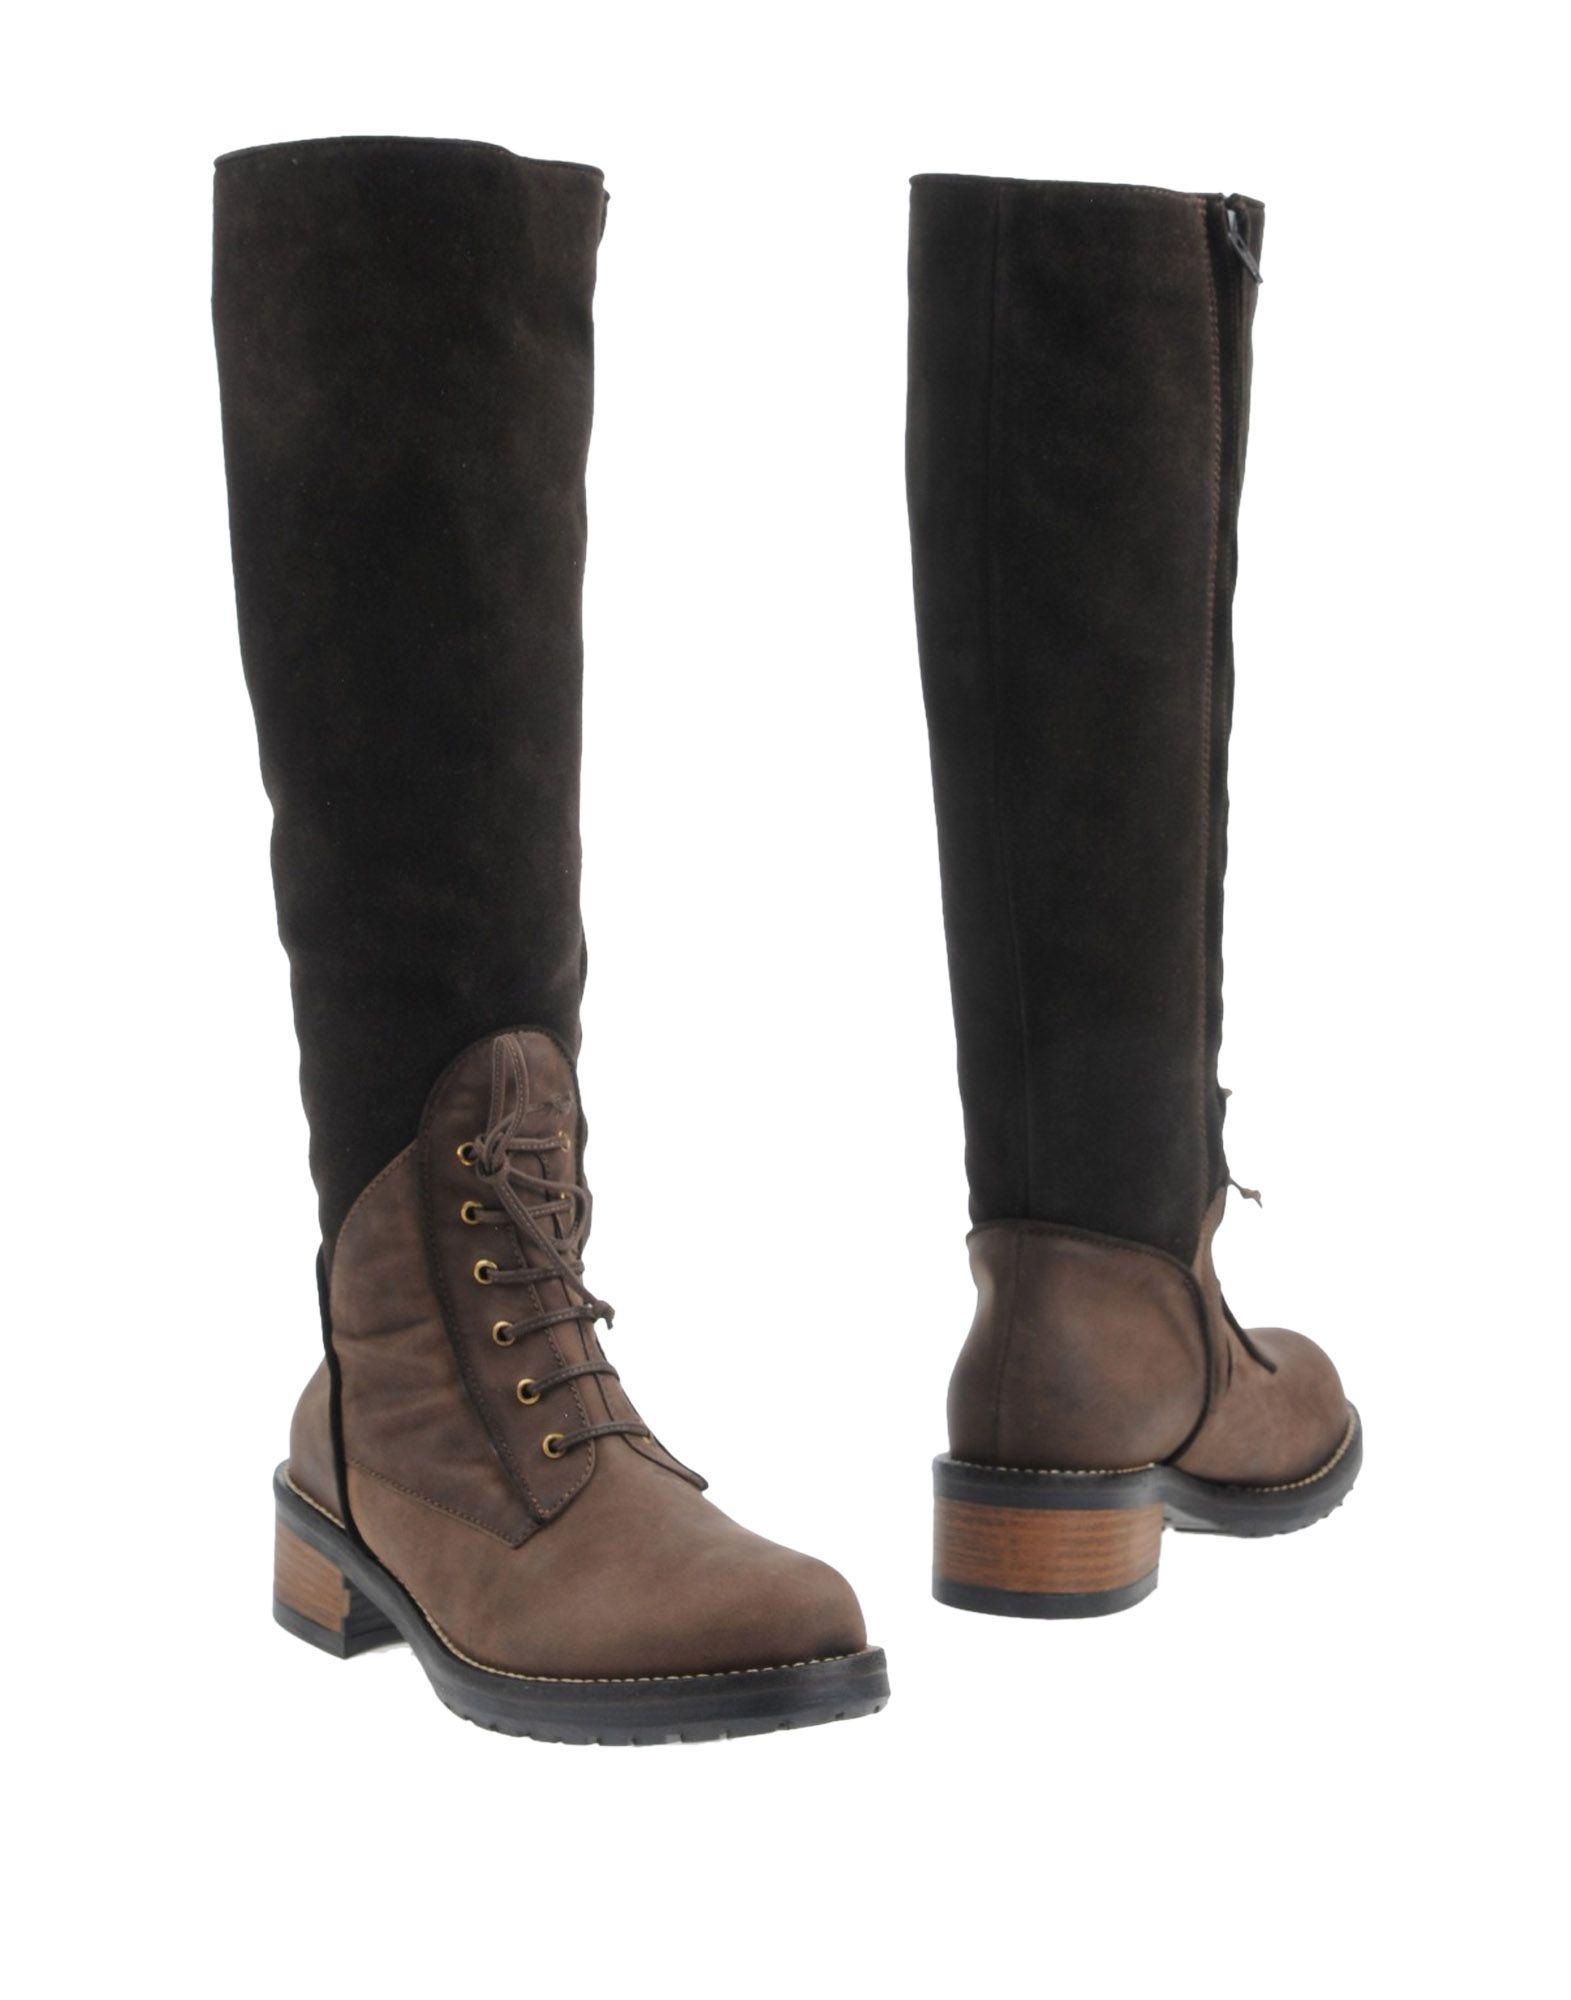 PETER FLOWERS Boots in Dark Brown